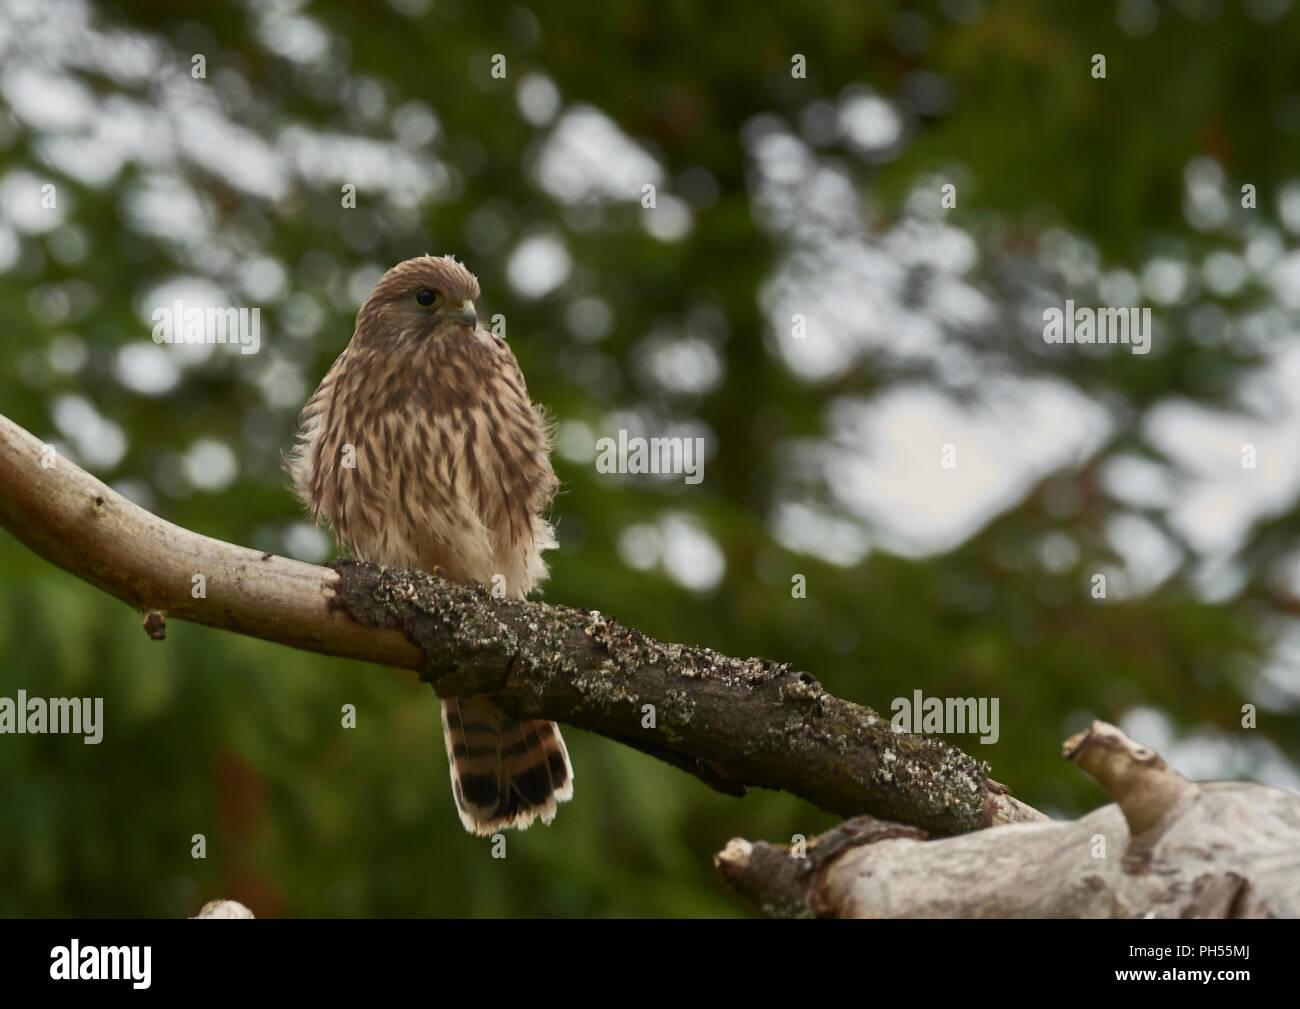 Young fledged female Common Kestrel, Falco tinnunculus, West Lothian, Scotland, UK - Stock Image